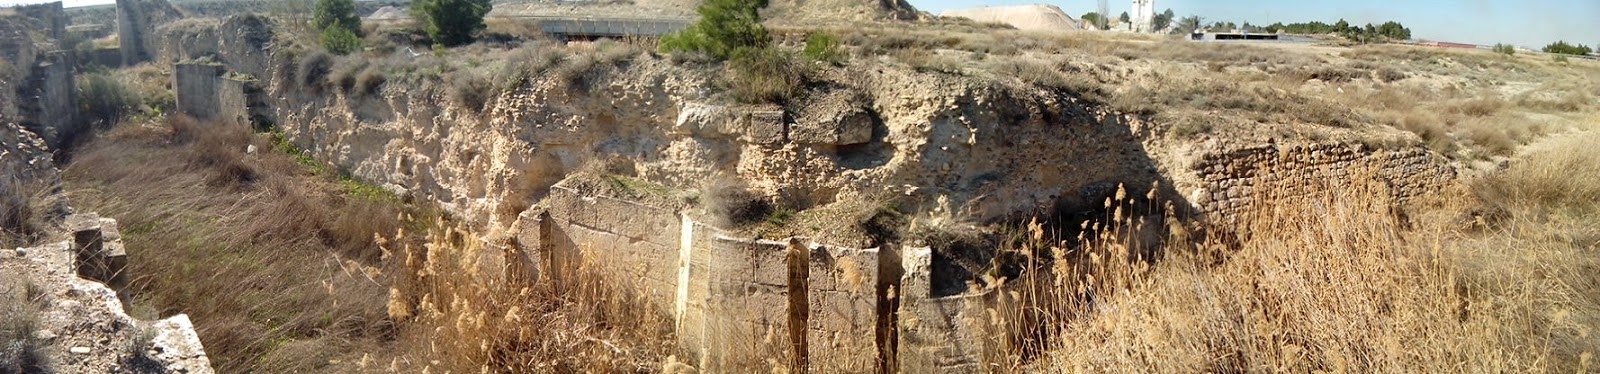 esclusas de Torrecilla de Valmadrid